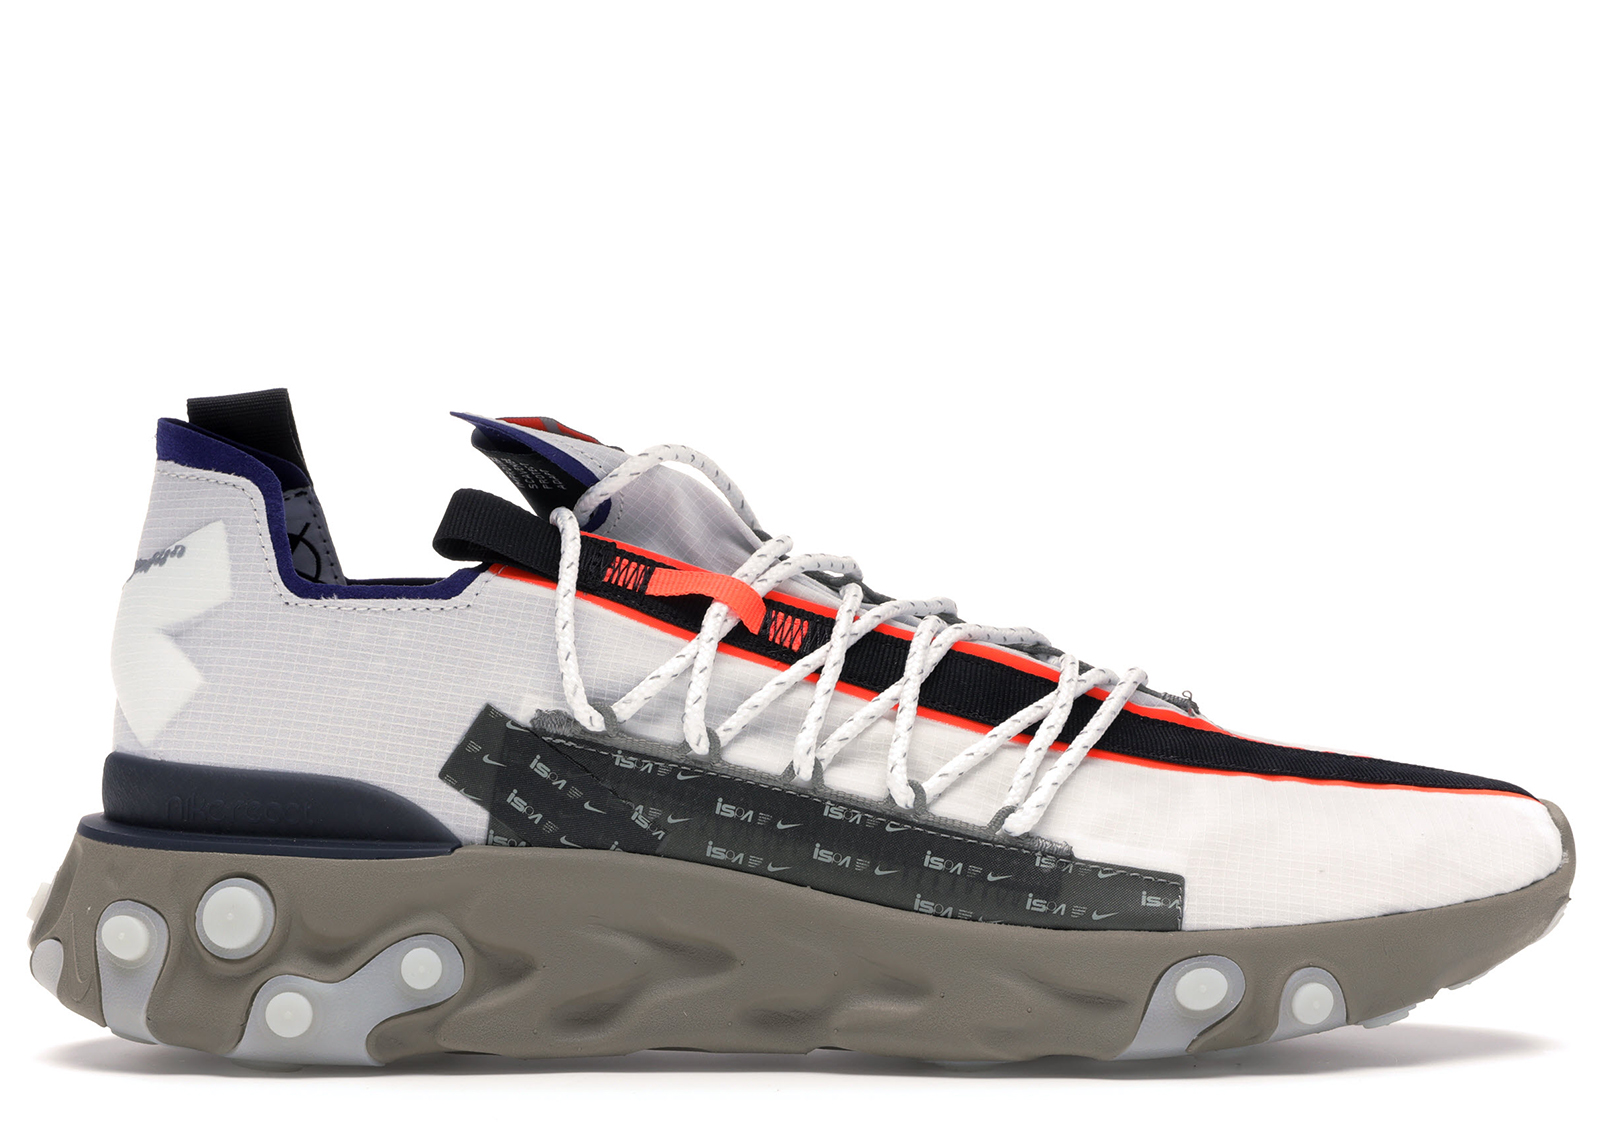 Nike ISPA React Low Summit White